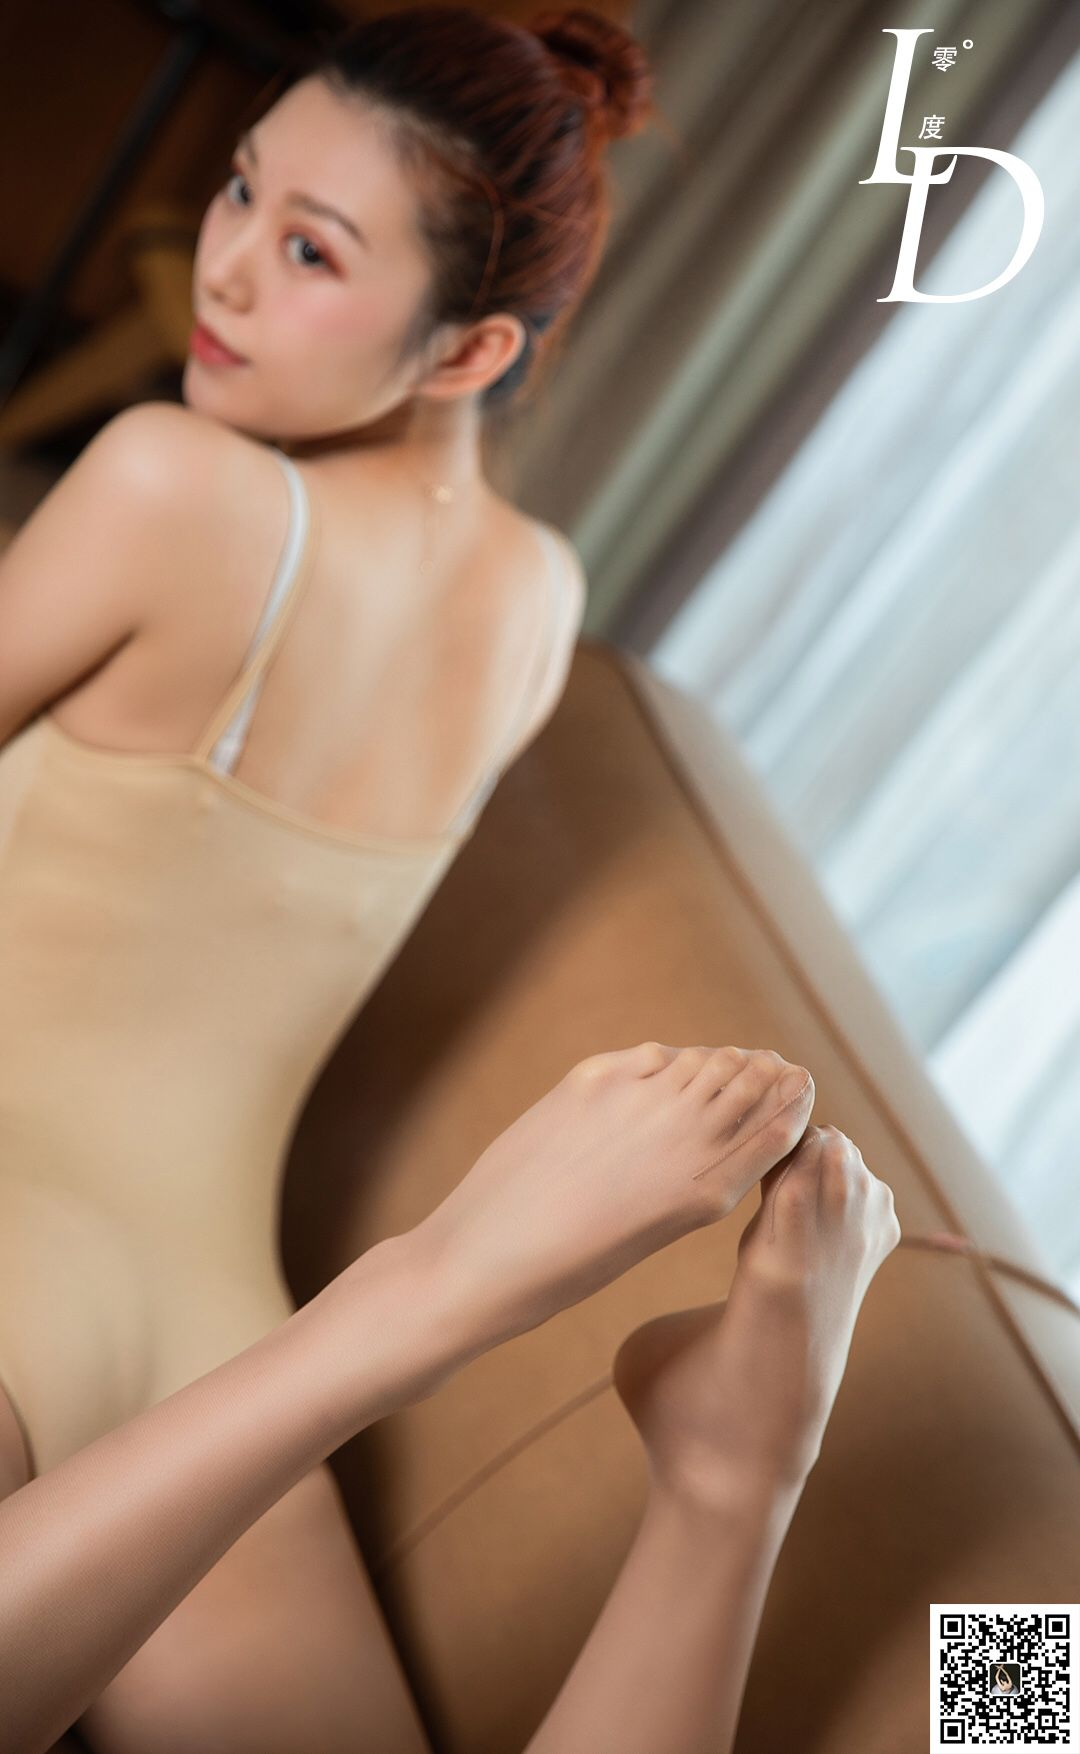 VOL.1718 [LD零度]体操服:心妍高品质写真套图(74P)